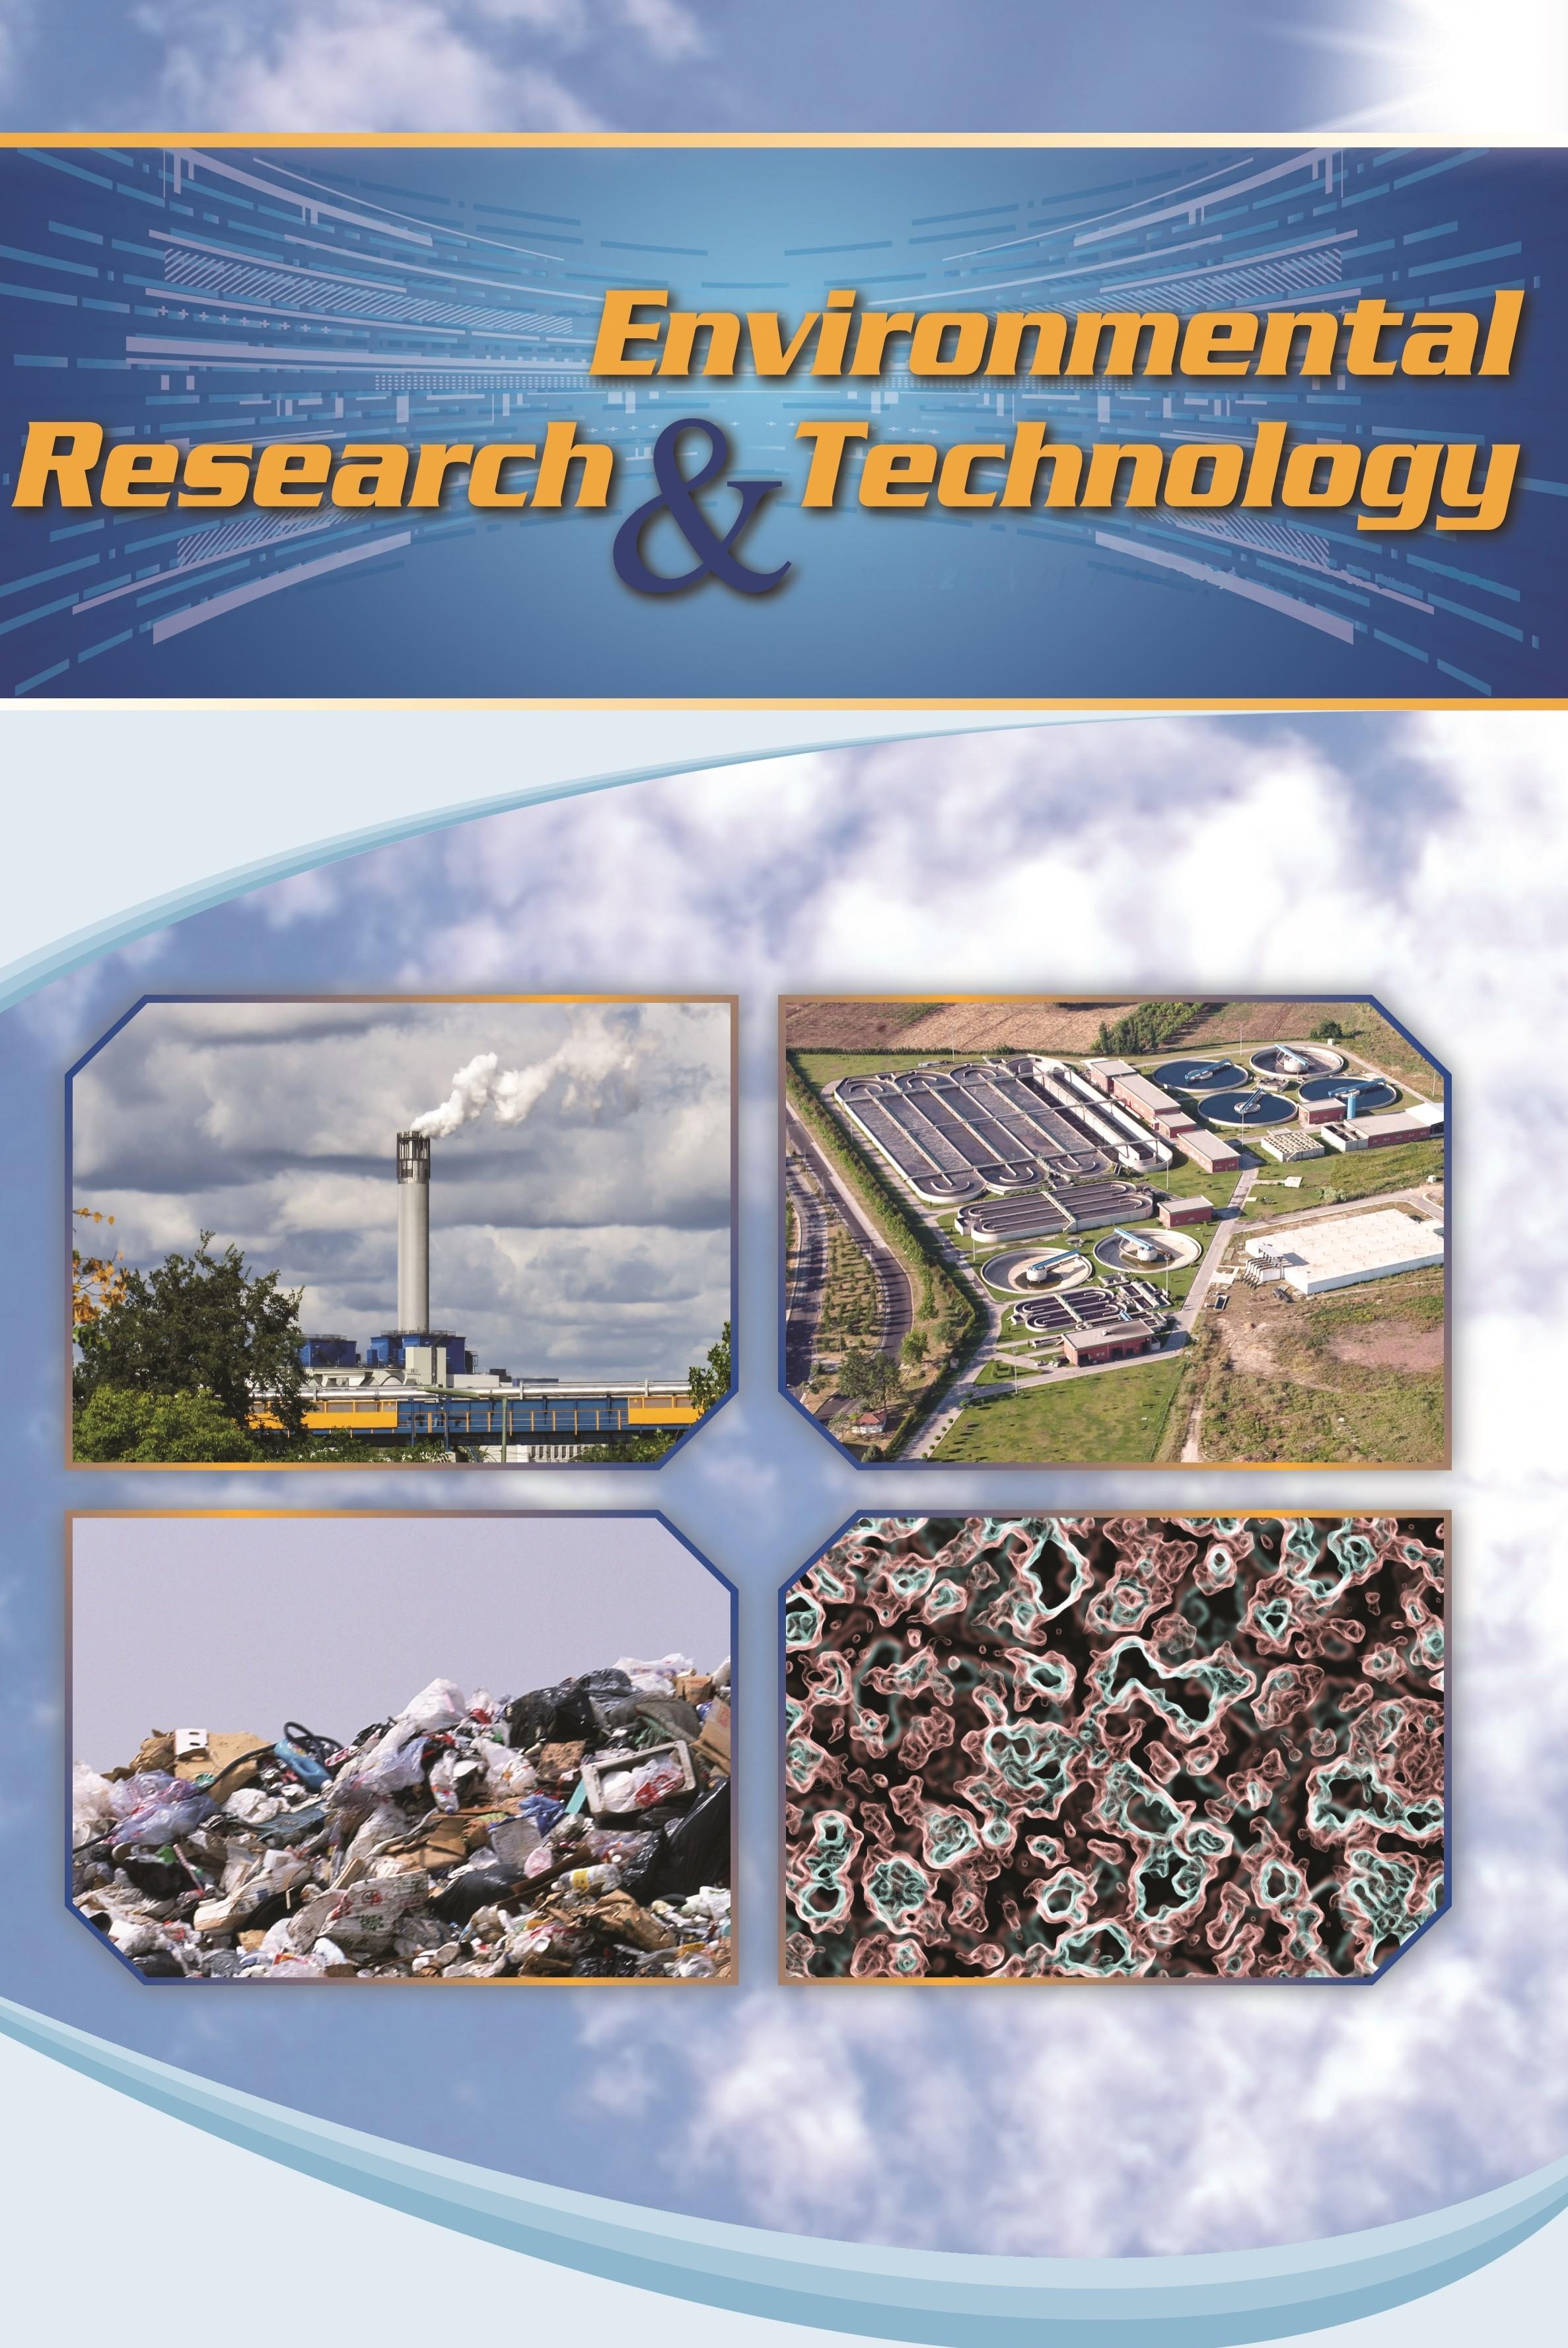 Environmental Research & Technology